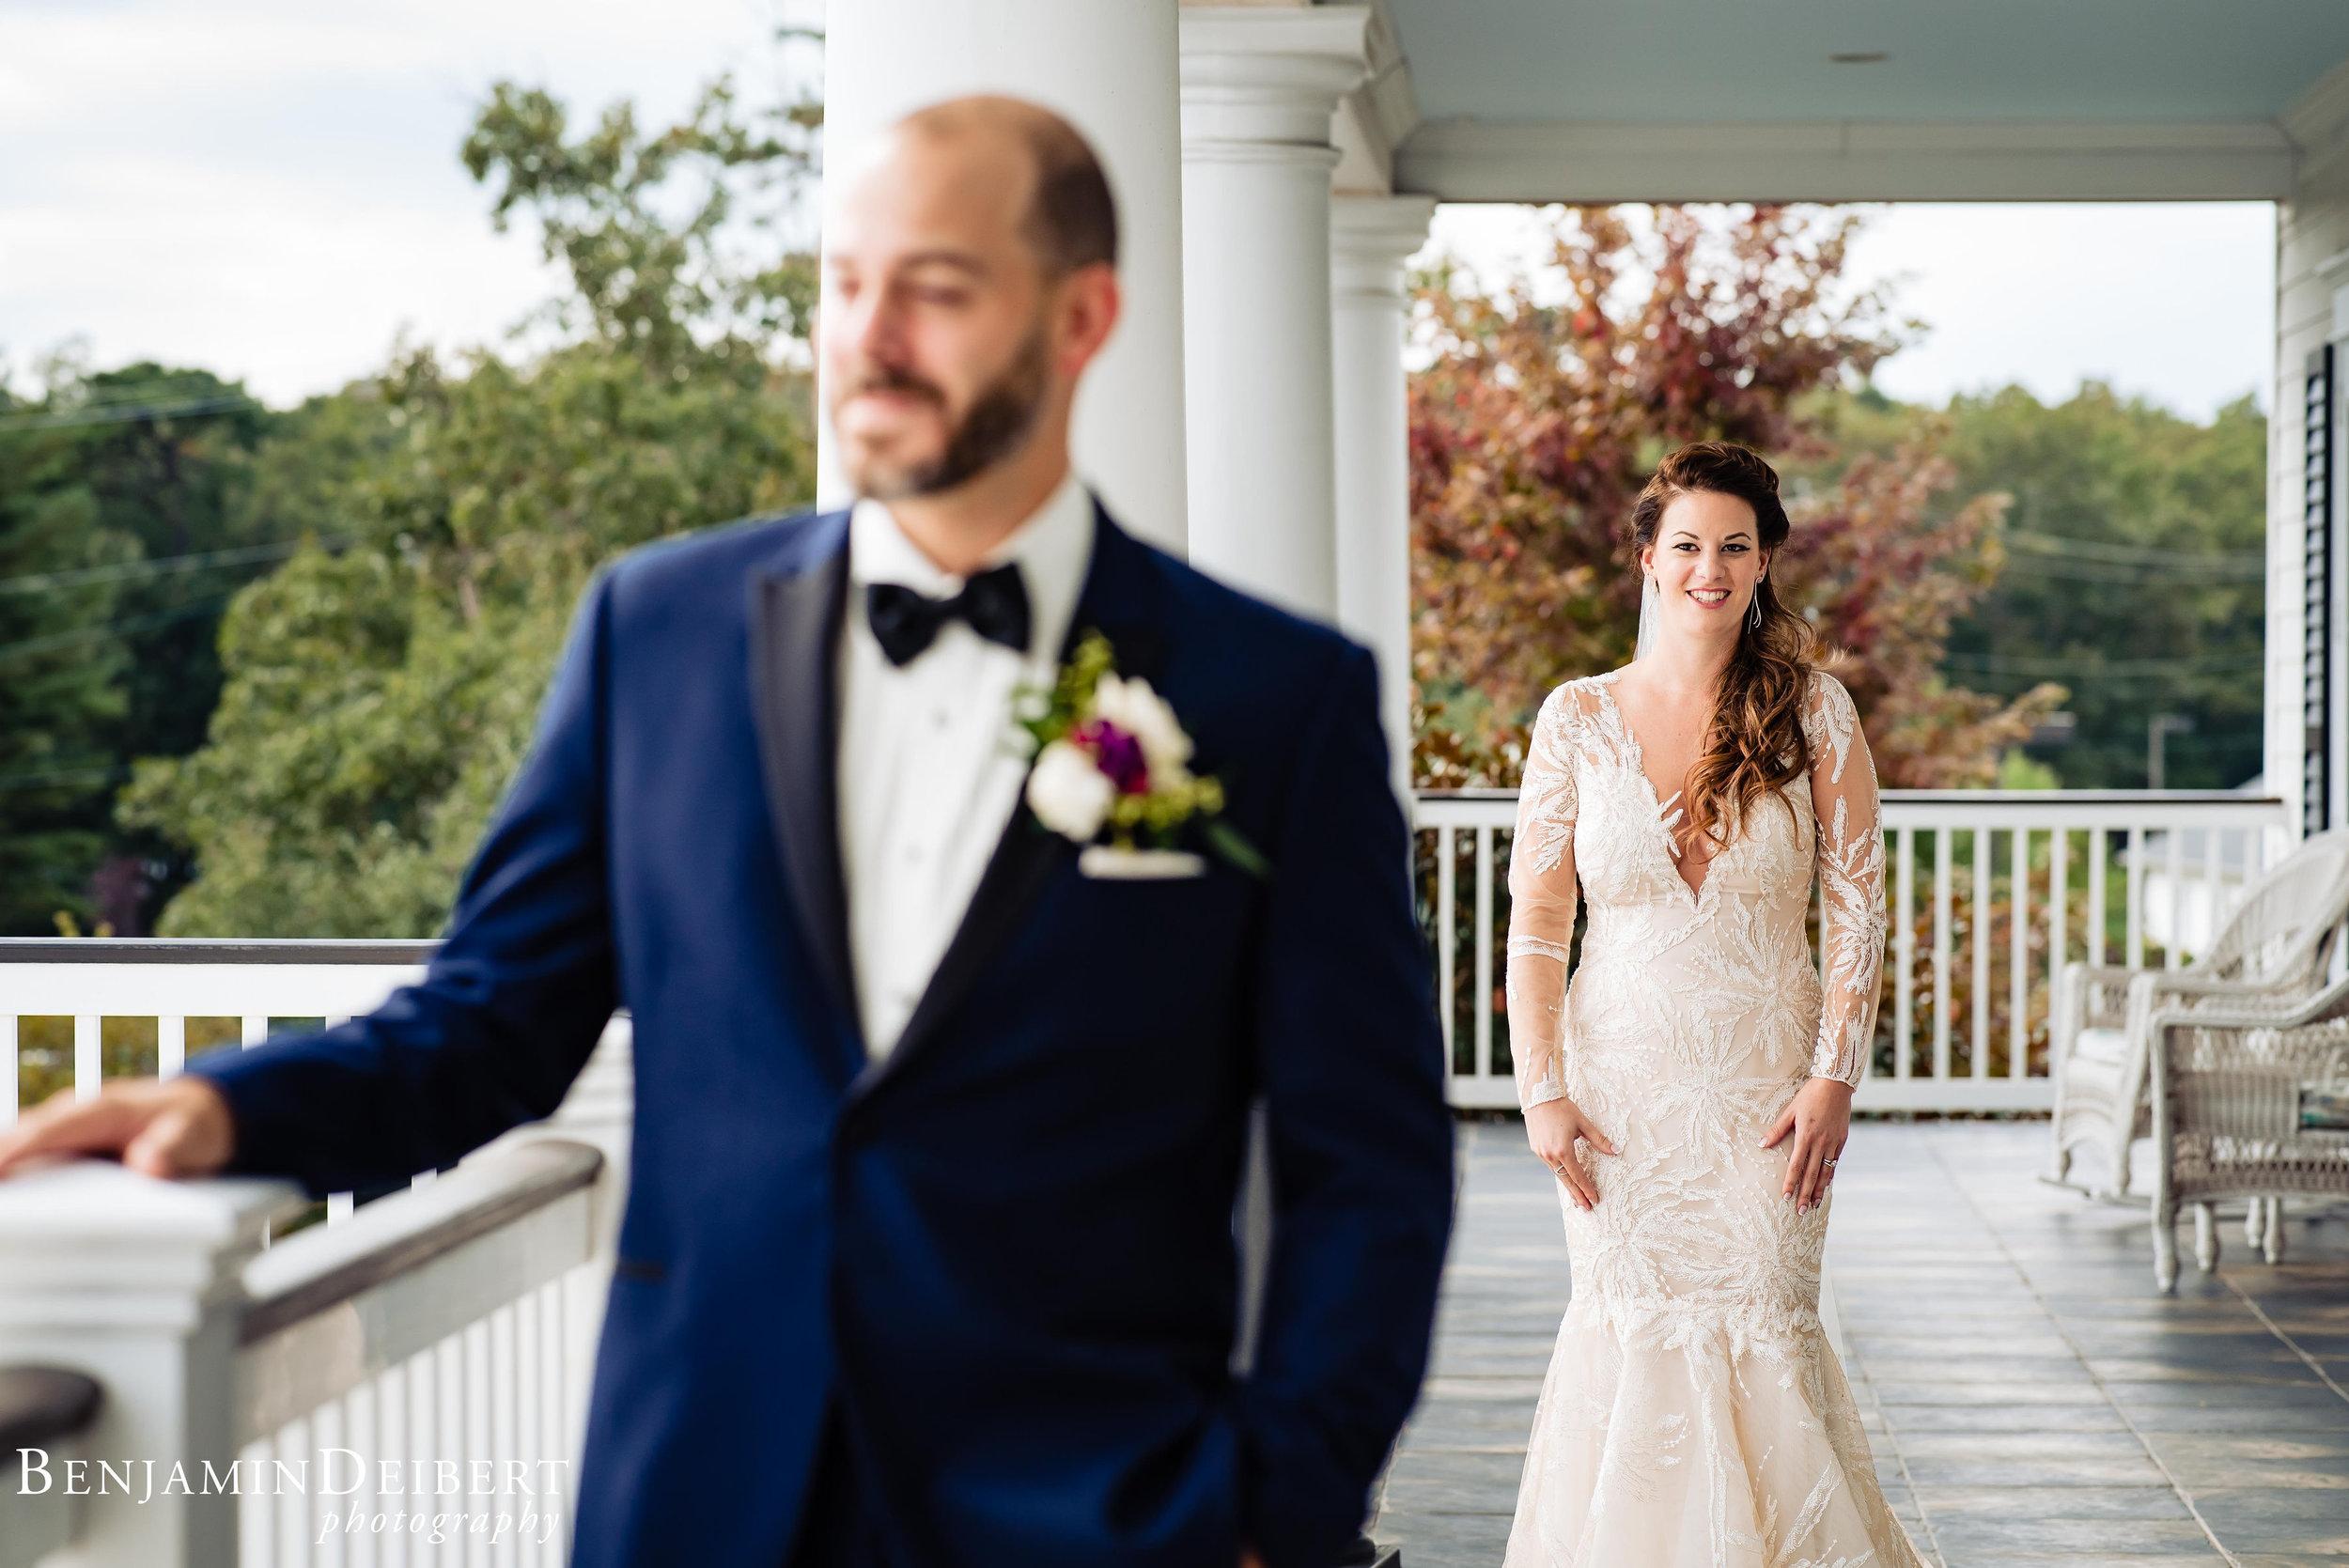 AmandaandElliott_TheCarriageHouse_Wedding-19.jpg